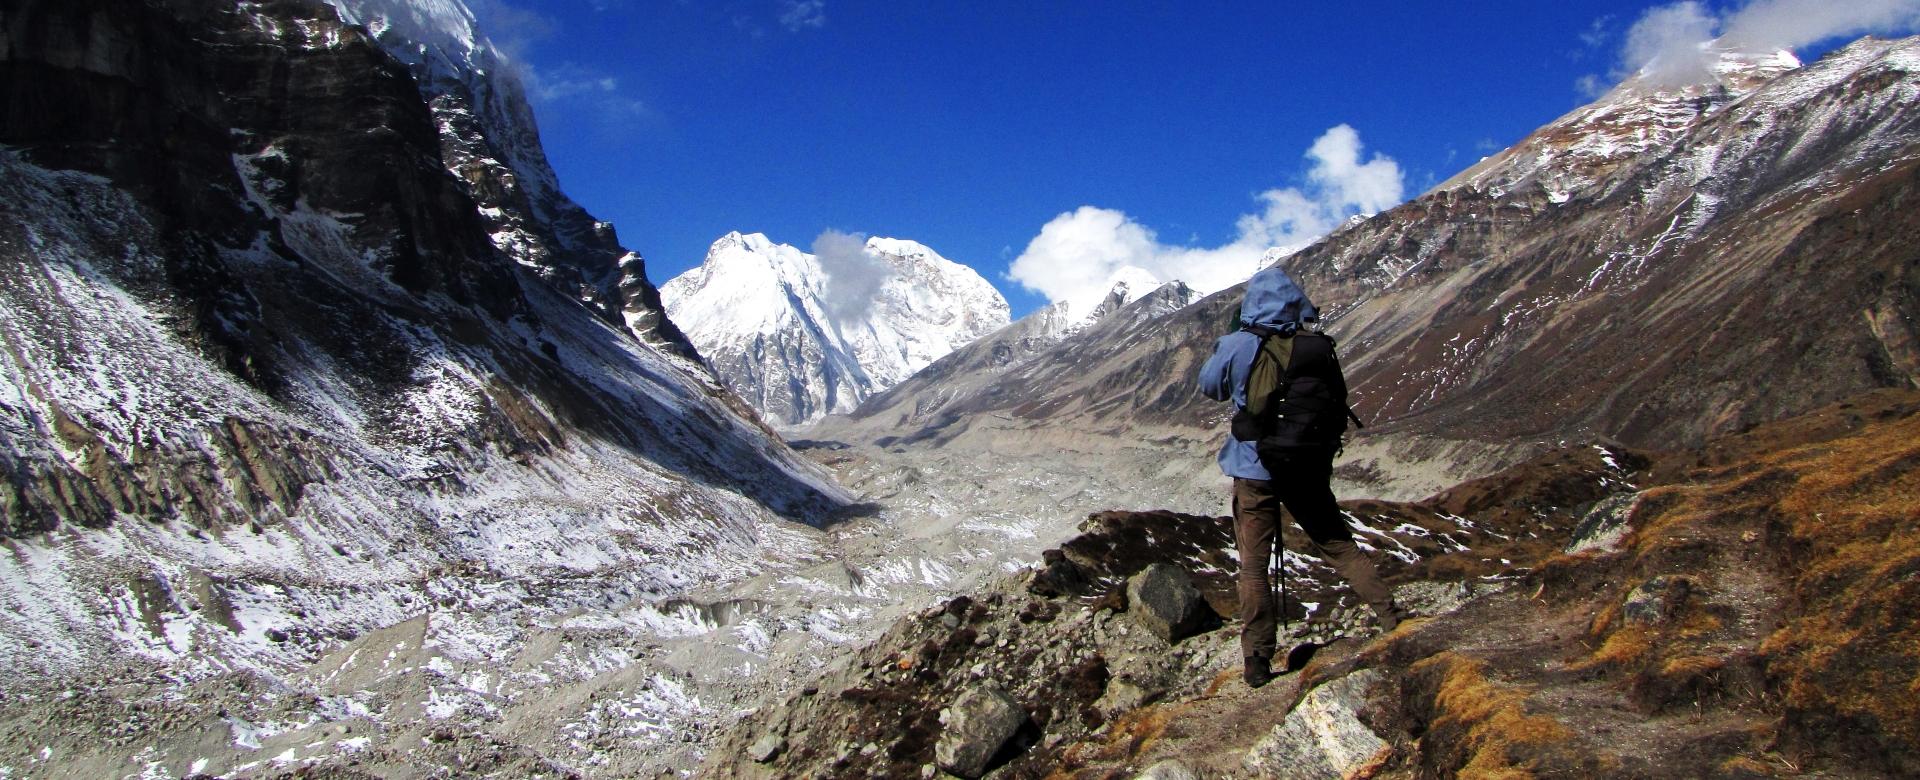 Voyage à pied : Nepal : Du kangchenjunga au makalu